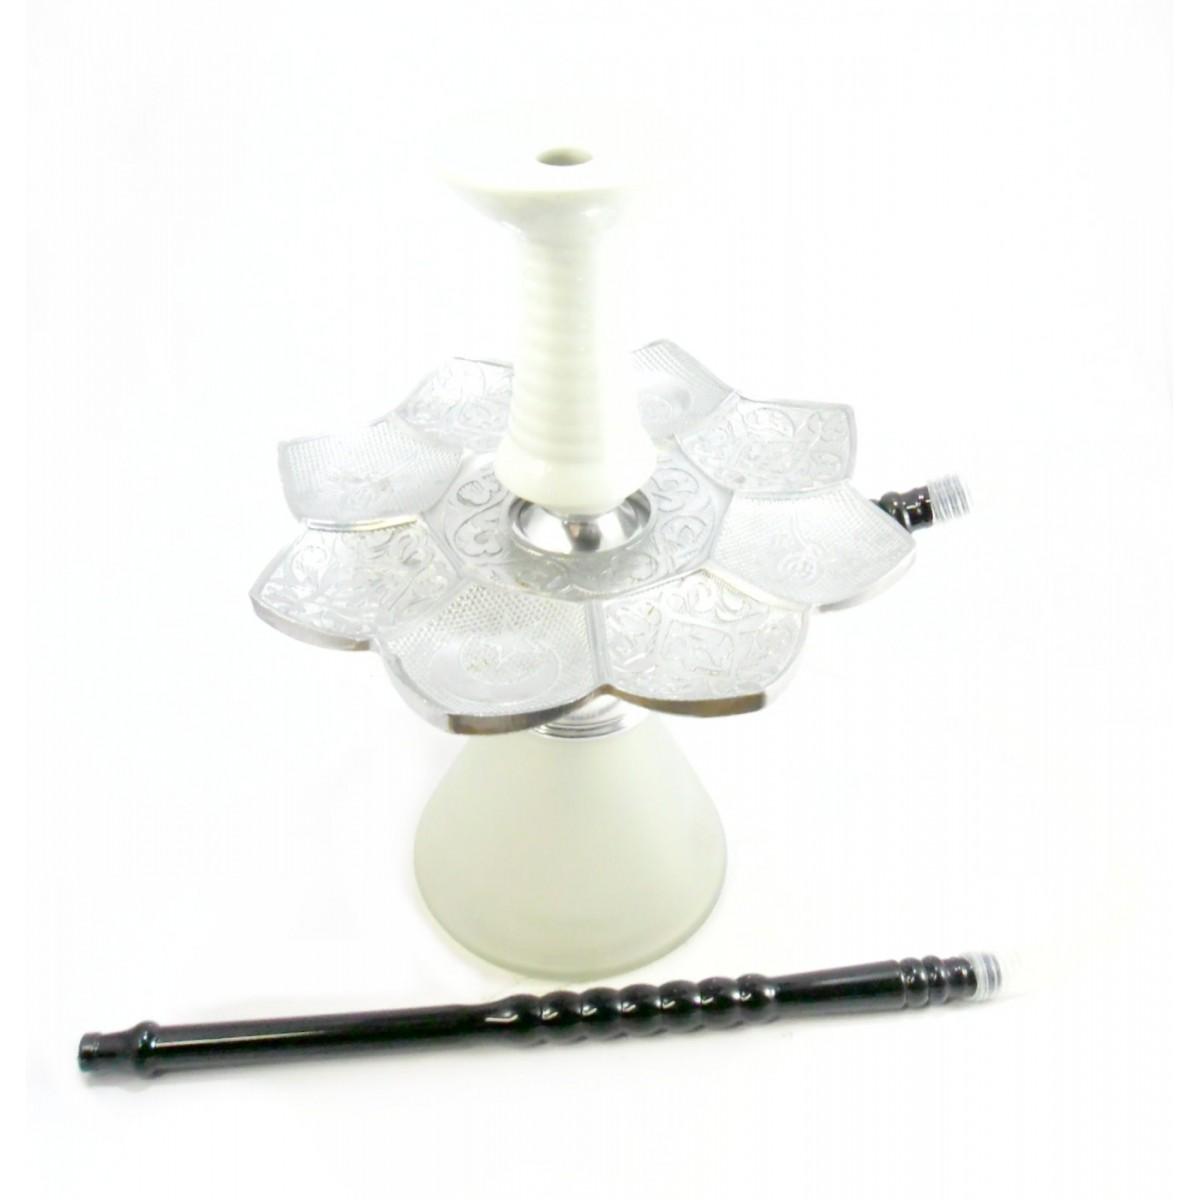 Narguile MD Hookah Bes COMPLETO alumínio 30cm, vaso BRANCO, mangueira MD, fornilho cerâmica funil, prato El Nefes Prata